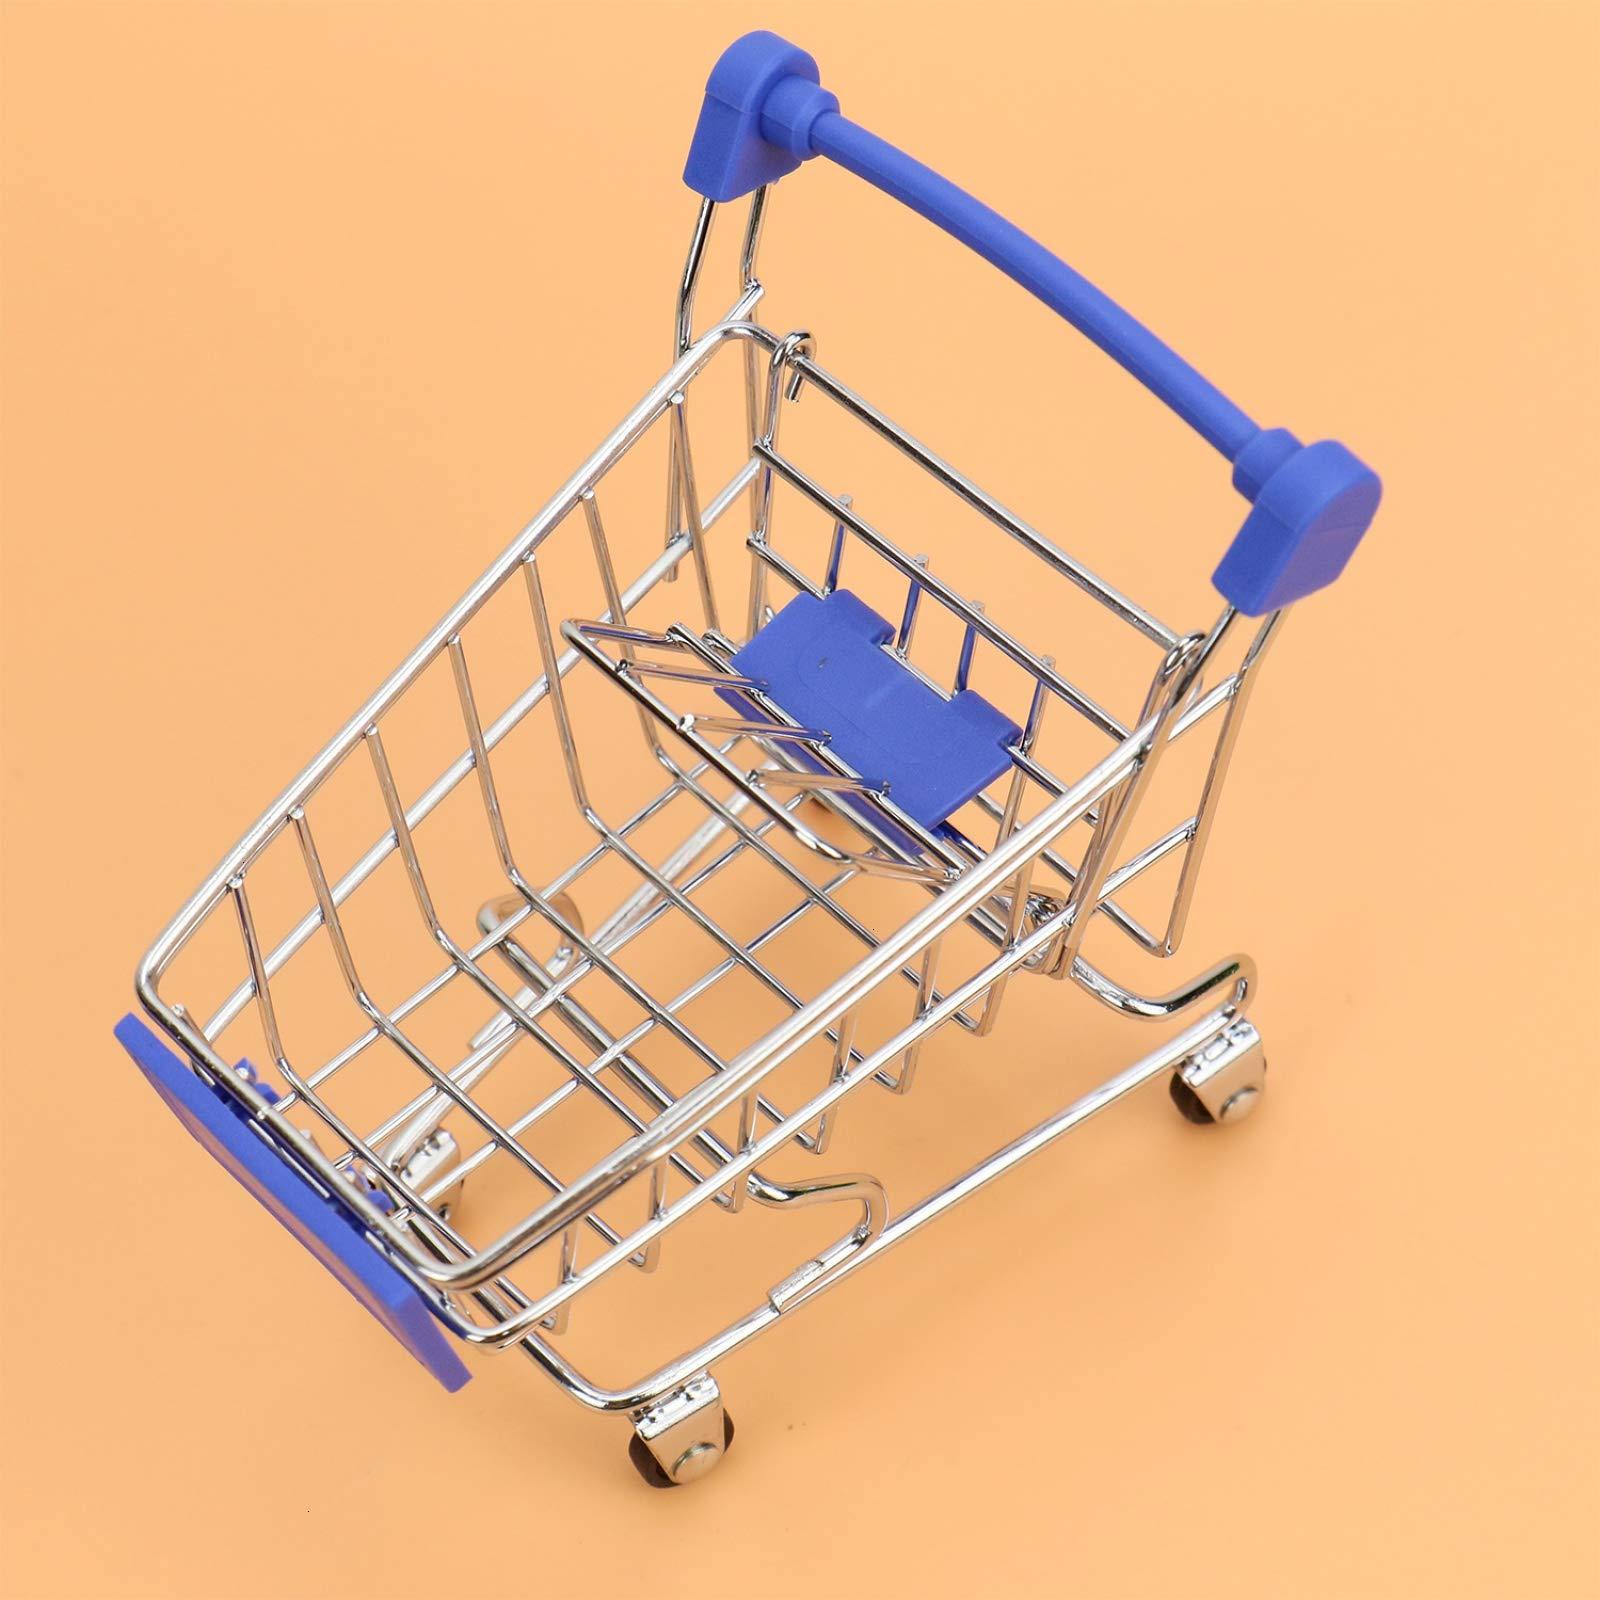 WSSROGY 3 Pack Mini Supermarket Handcart Cart Mode Storage Toy Table Office Novelty Decoration by WSSROGY (Image #3)